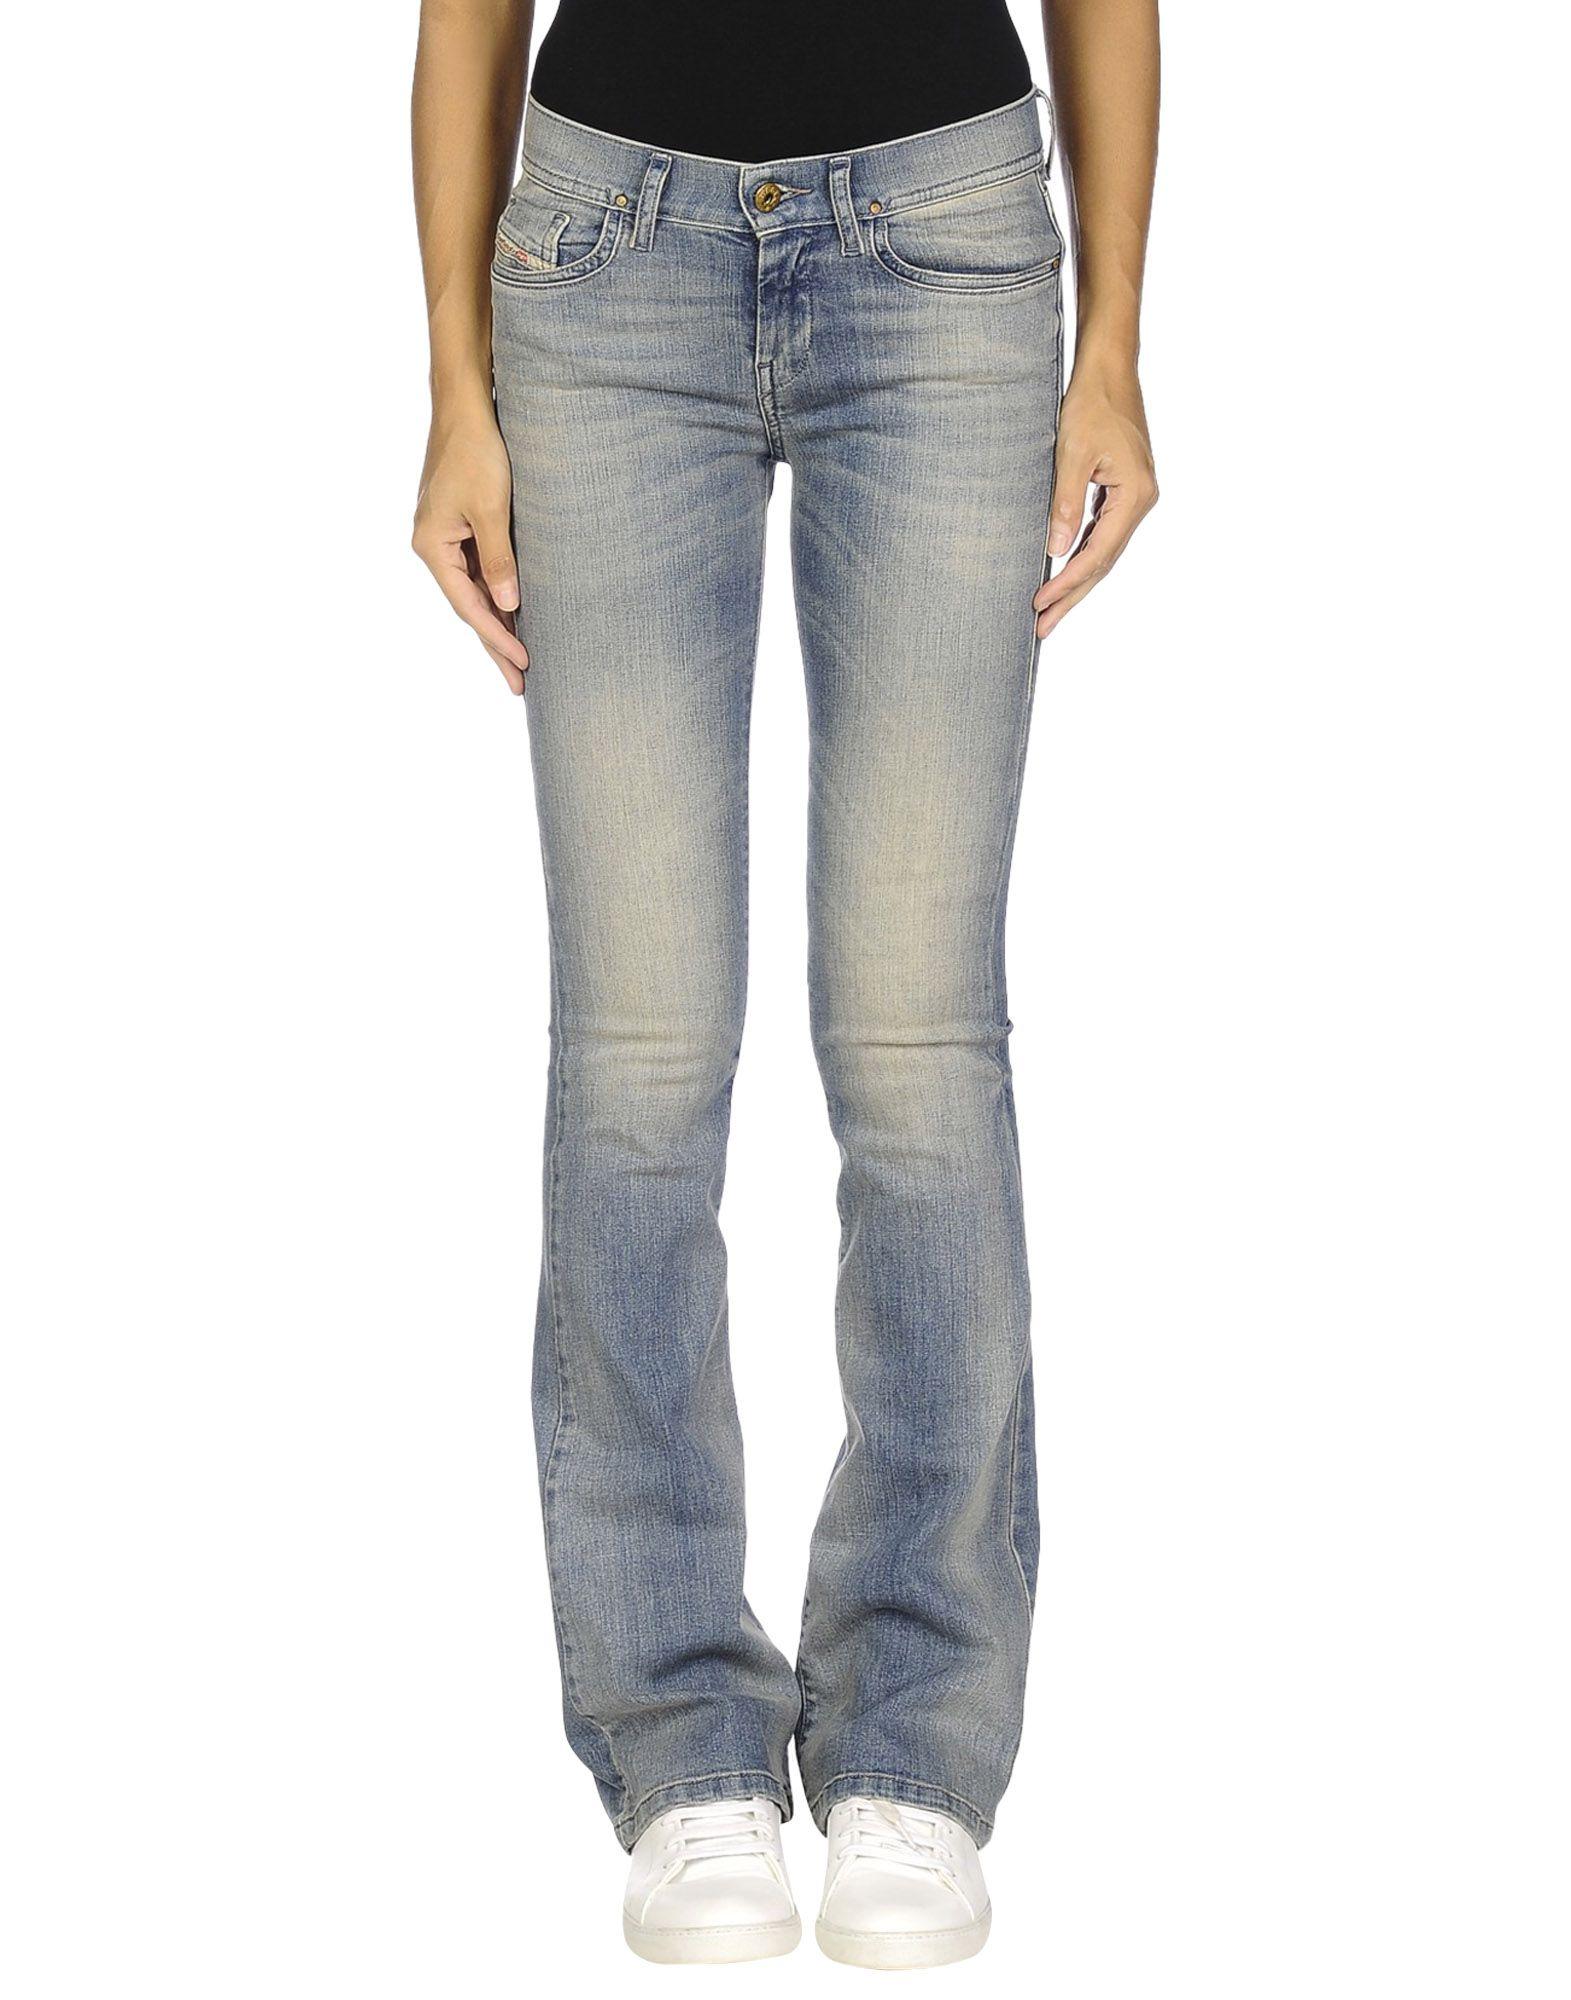 DIESEL Damen Jeanshose Farbe Blau Größe 4